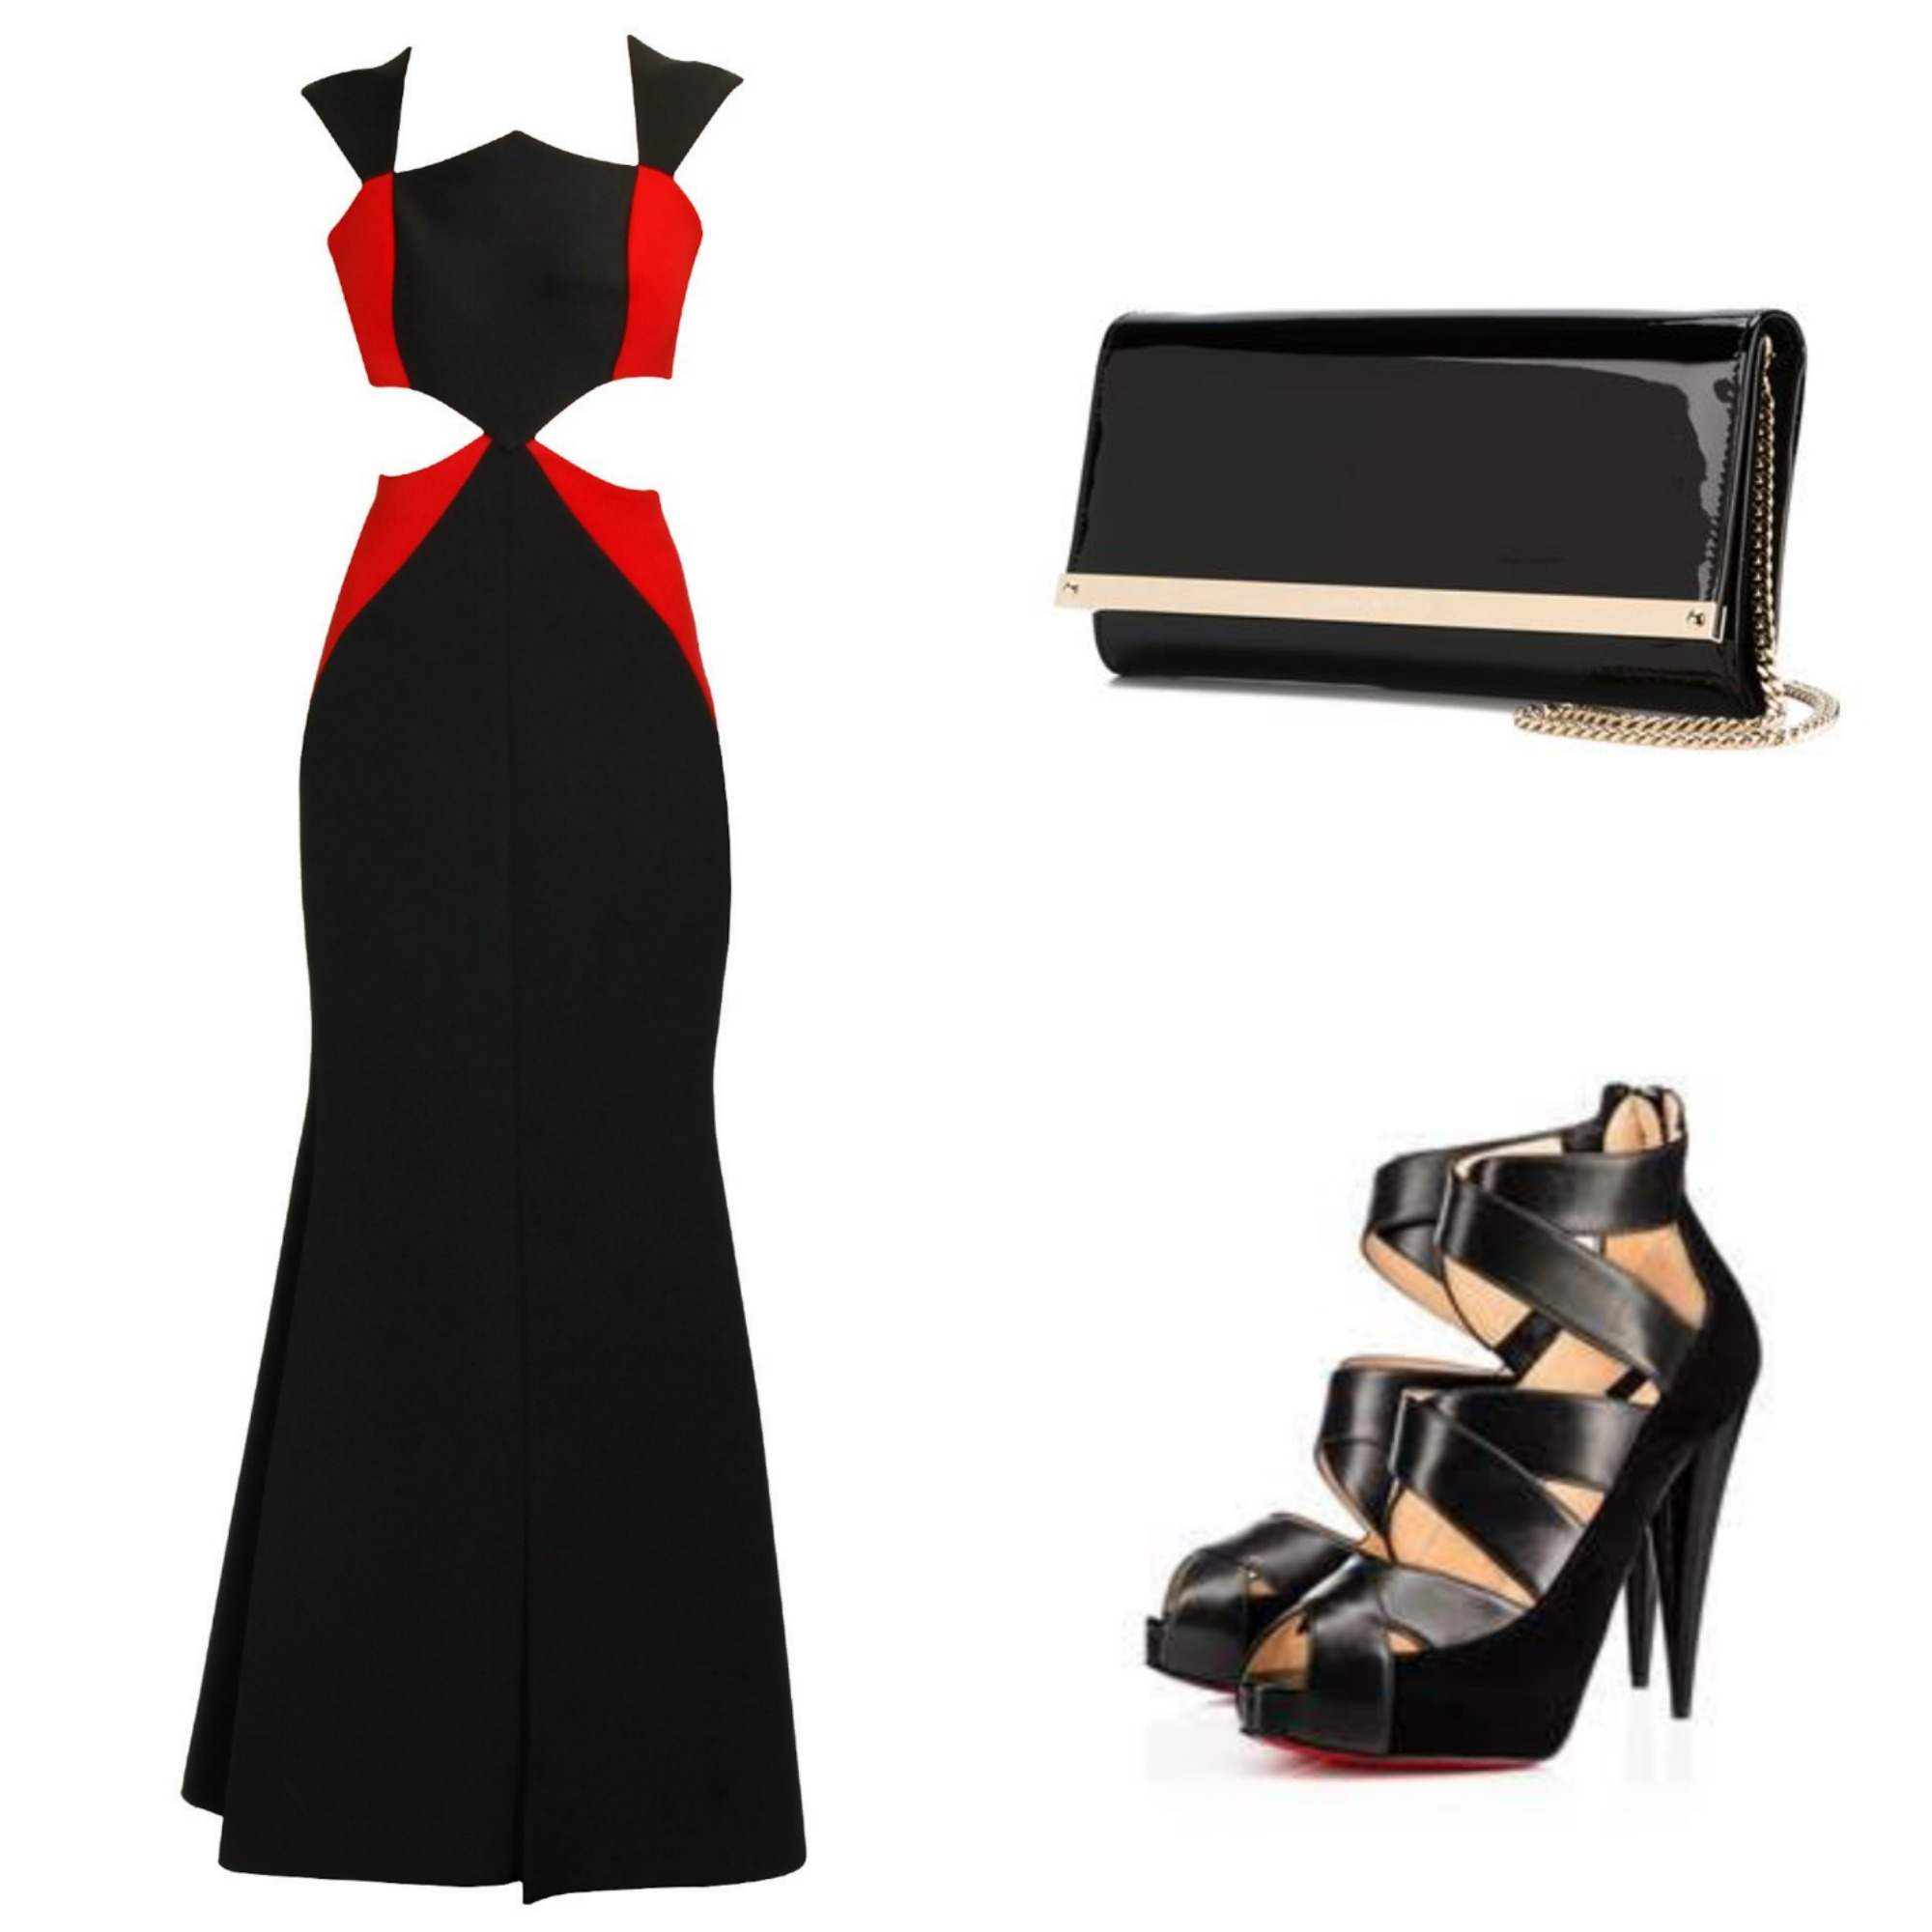 Dress: Carousel by Simran Arya; Shoes: Christian Louboutin; Bag: Jimmy Choo (Farfetch.com)